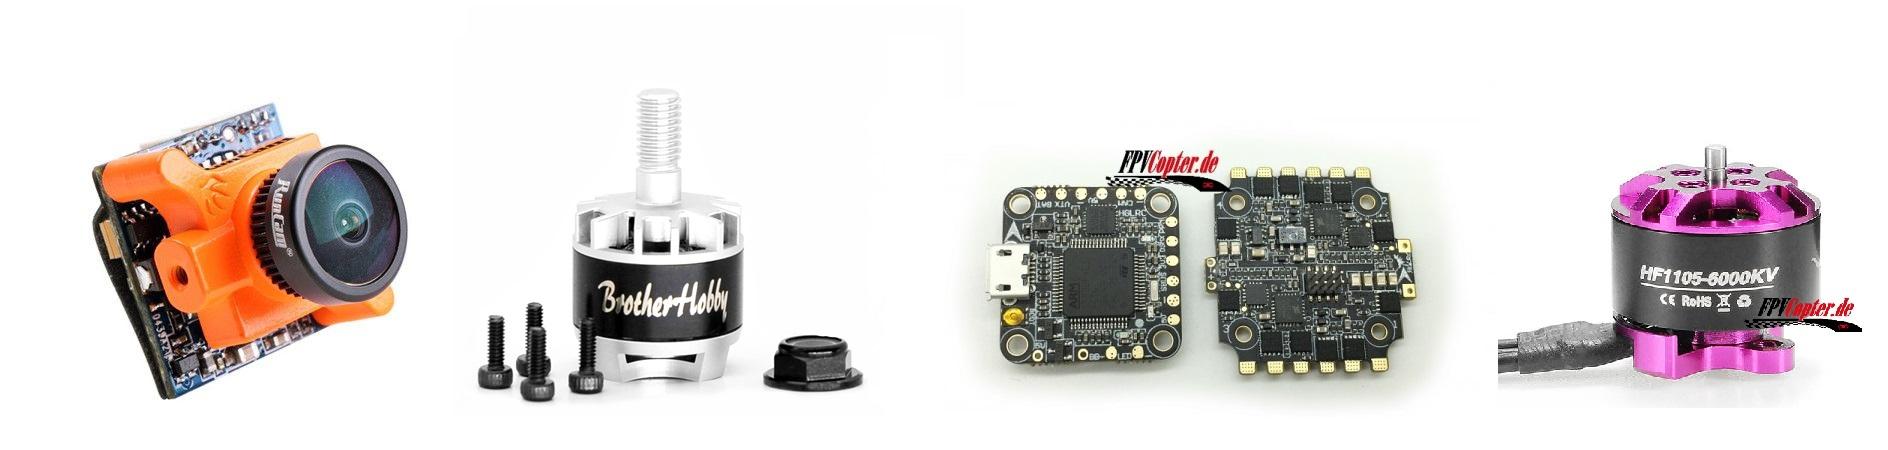 Racer-Set-fpv-micro-cam-runcam